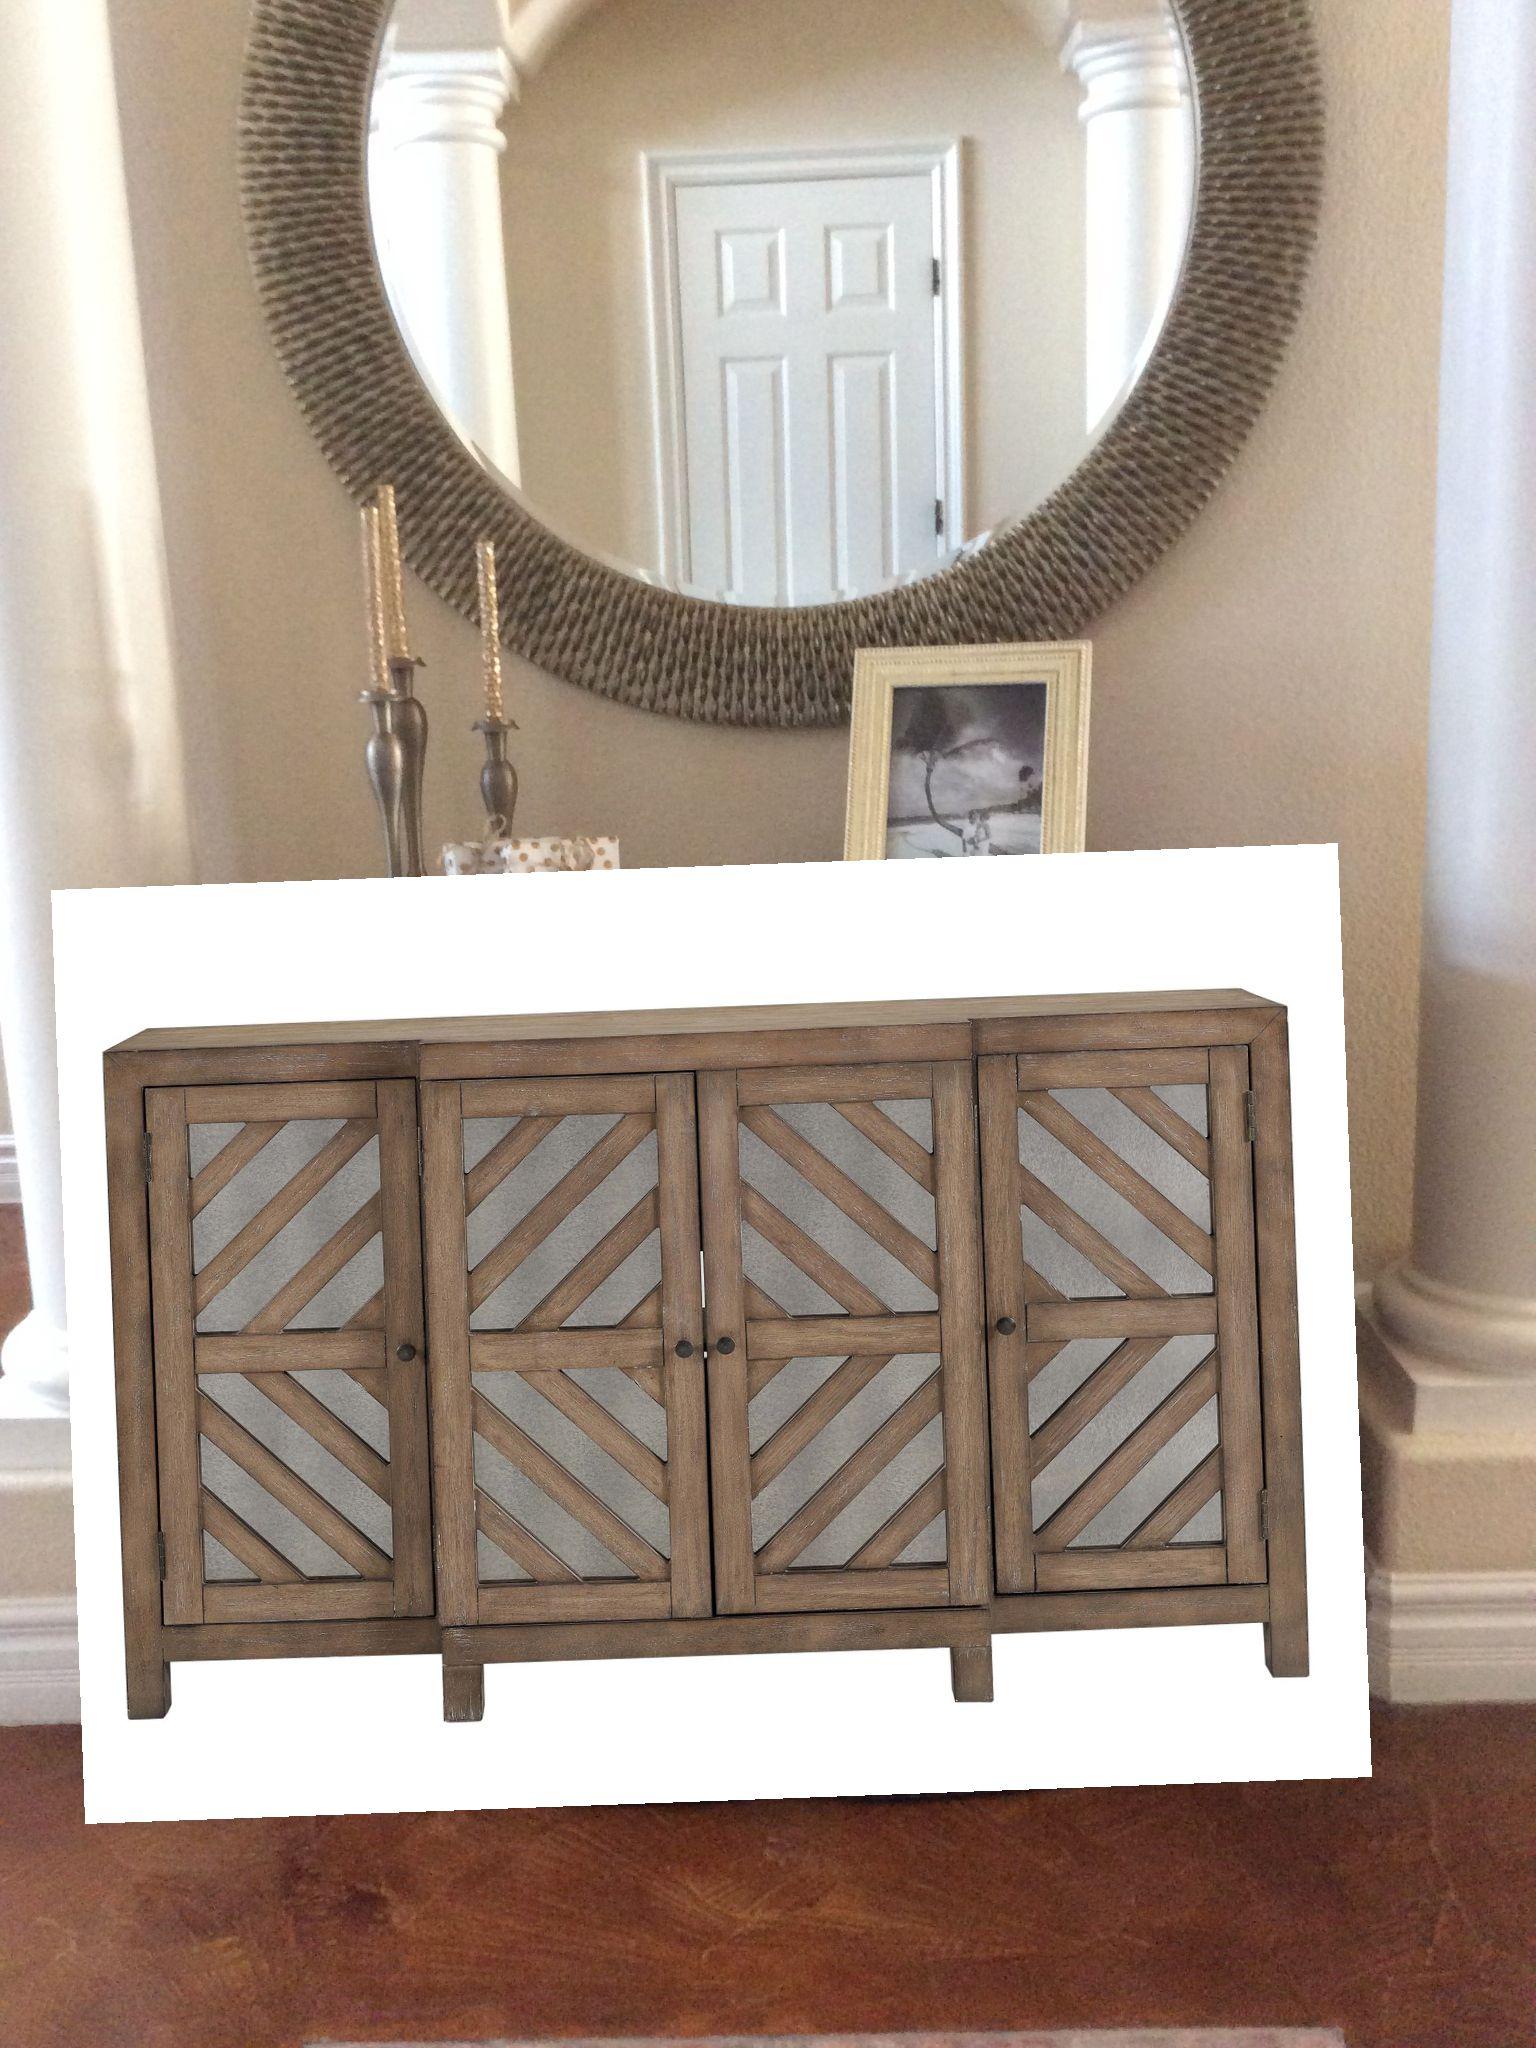 Lowrey Credenza | Home Design | Credenza, Furniture, House With Regard To Lowrey Credenzas (View 3 of 30)